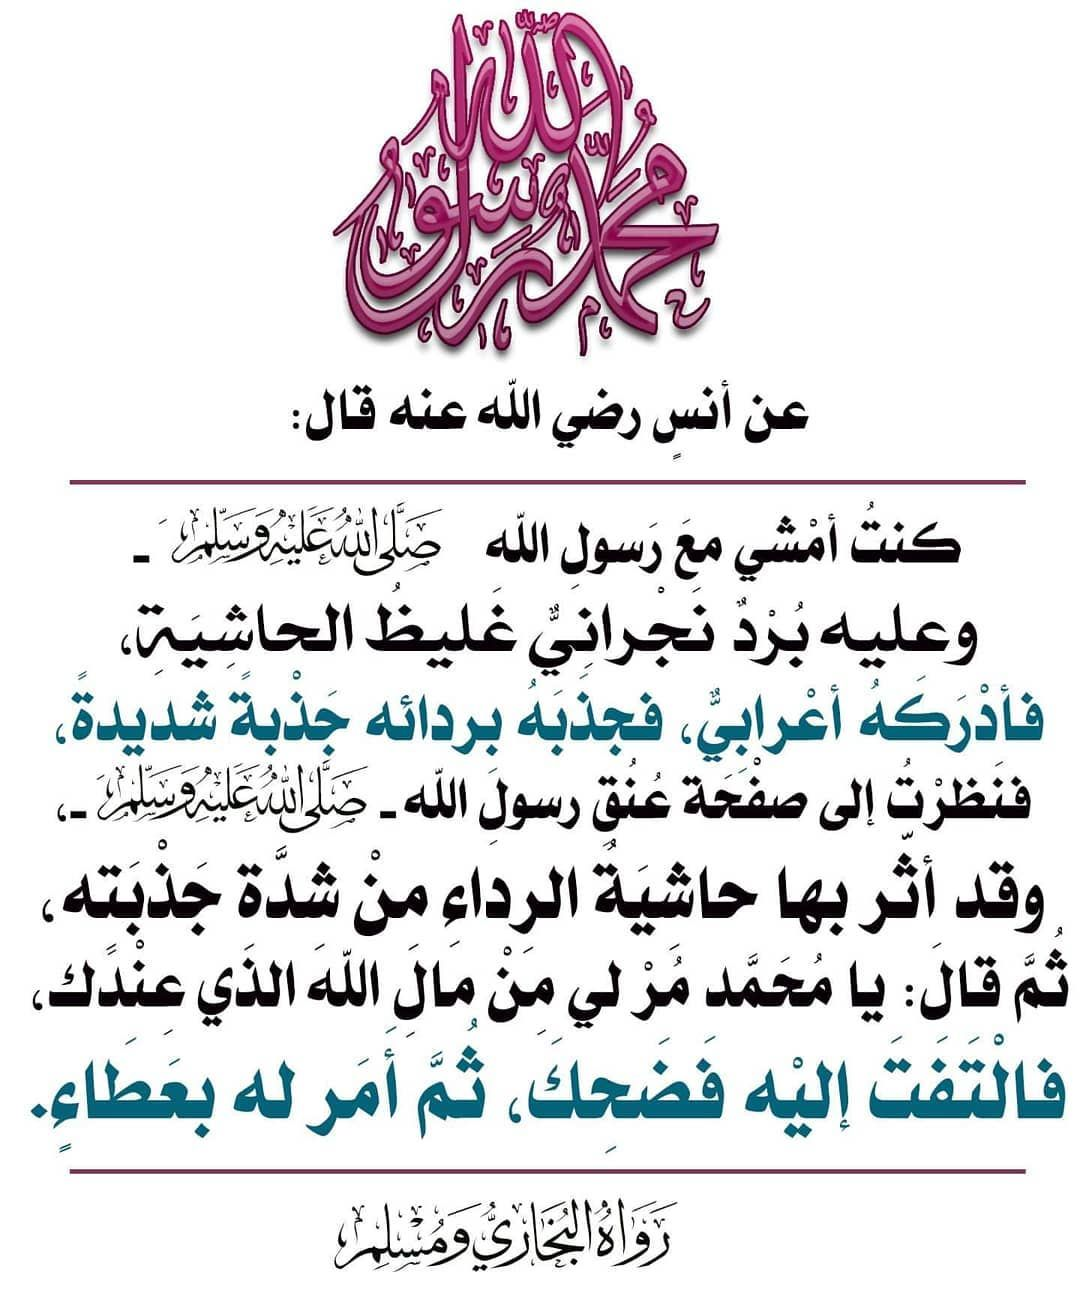 Publication Instagram Par أحاديث البخاري ومسلم 31 Dec 2018 A 5 57 Utc Arabic Calligraphy Instagram Posts Calligraphy